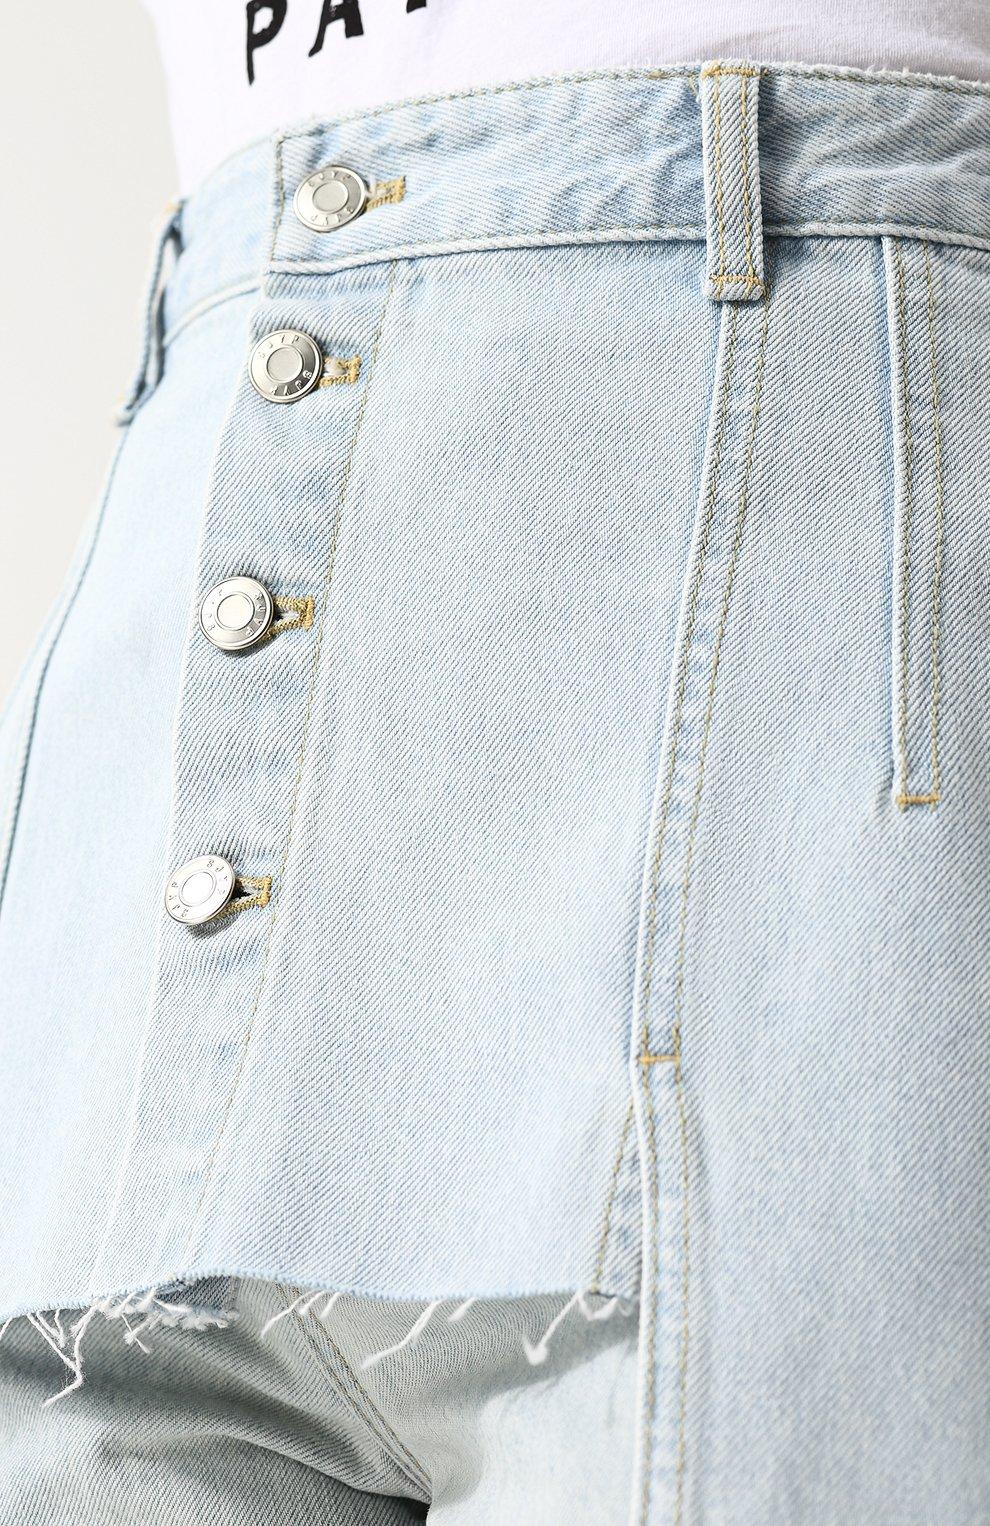 Женская джинсовая мини-юбка с потертостями STEVE J & YONI P голубого цвета, арт. PWMS2D-S01900   Фото 5